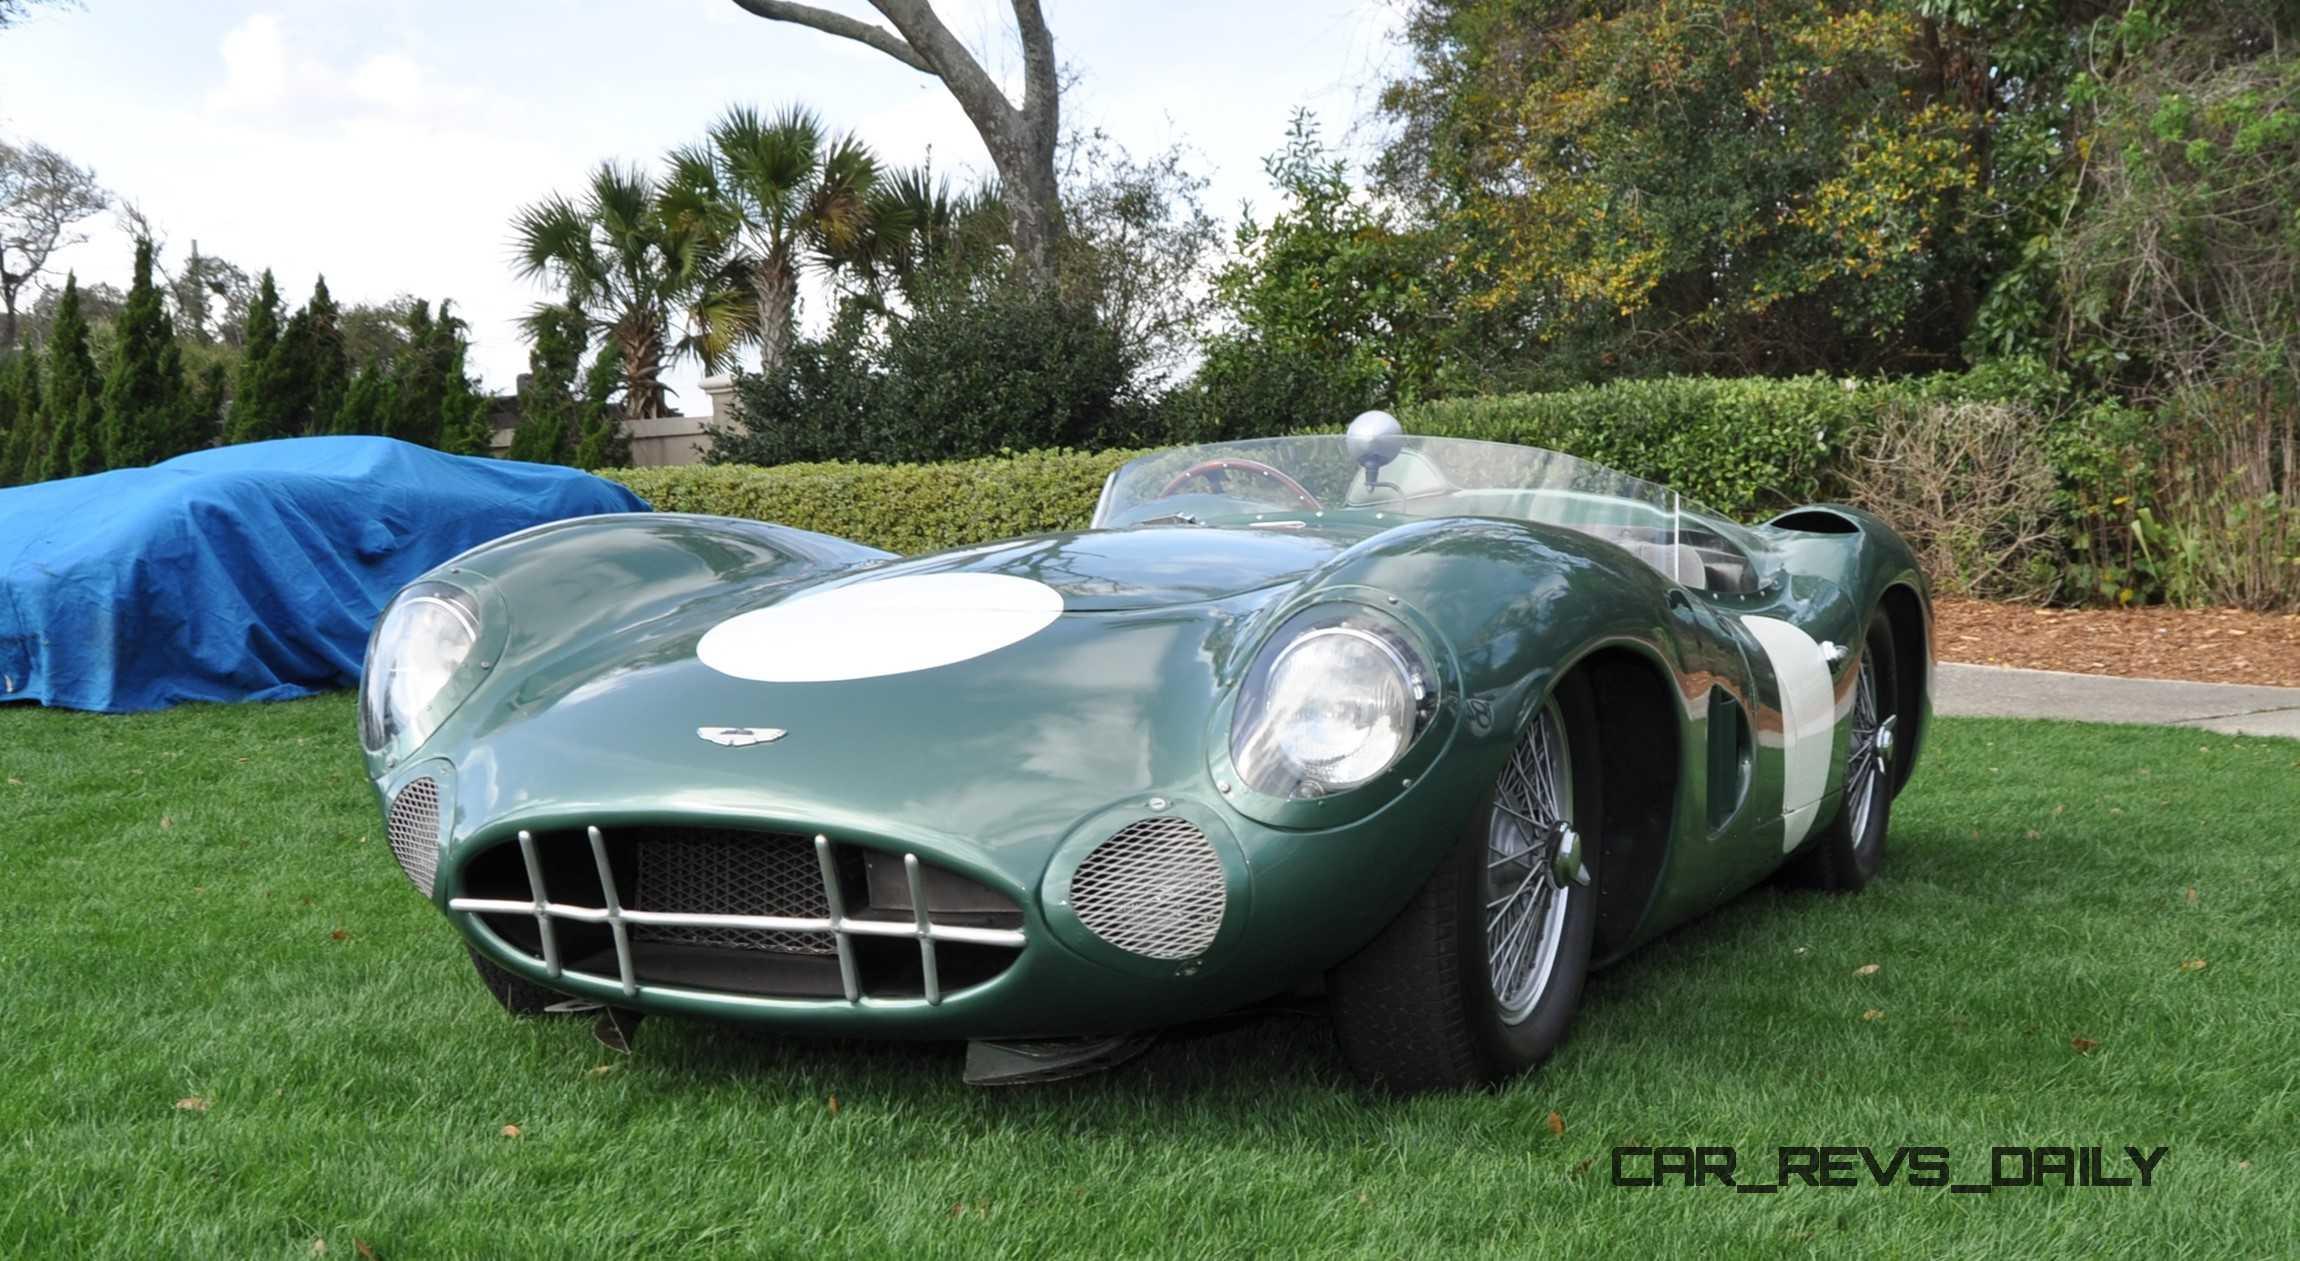 Aston Martin DBR - 1957 aston martin